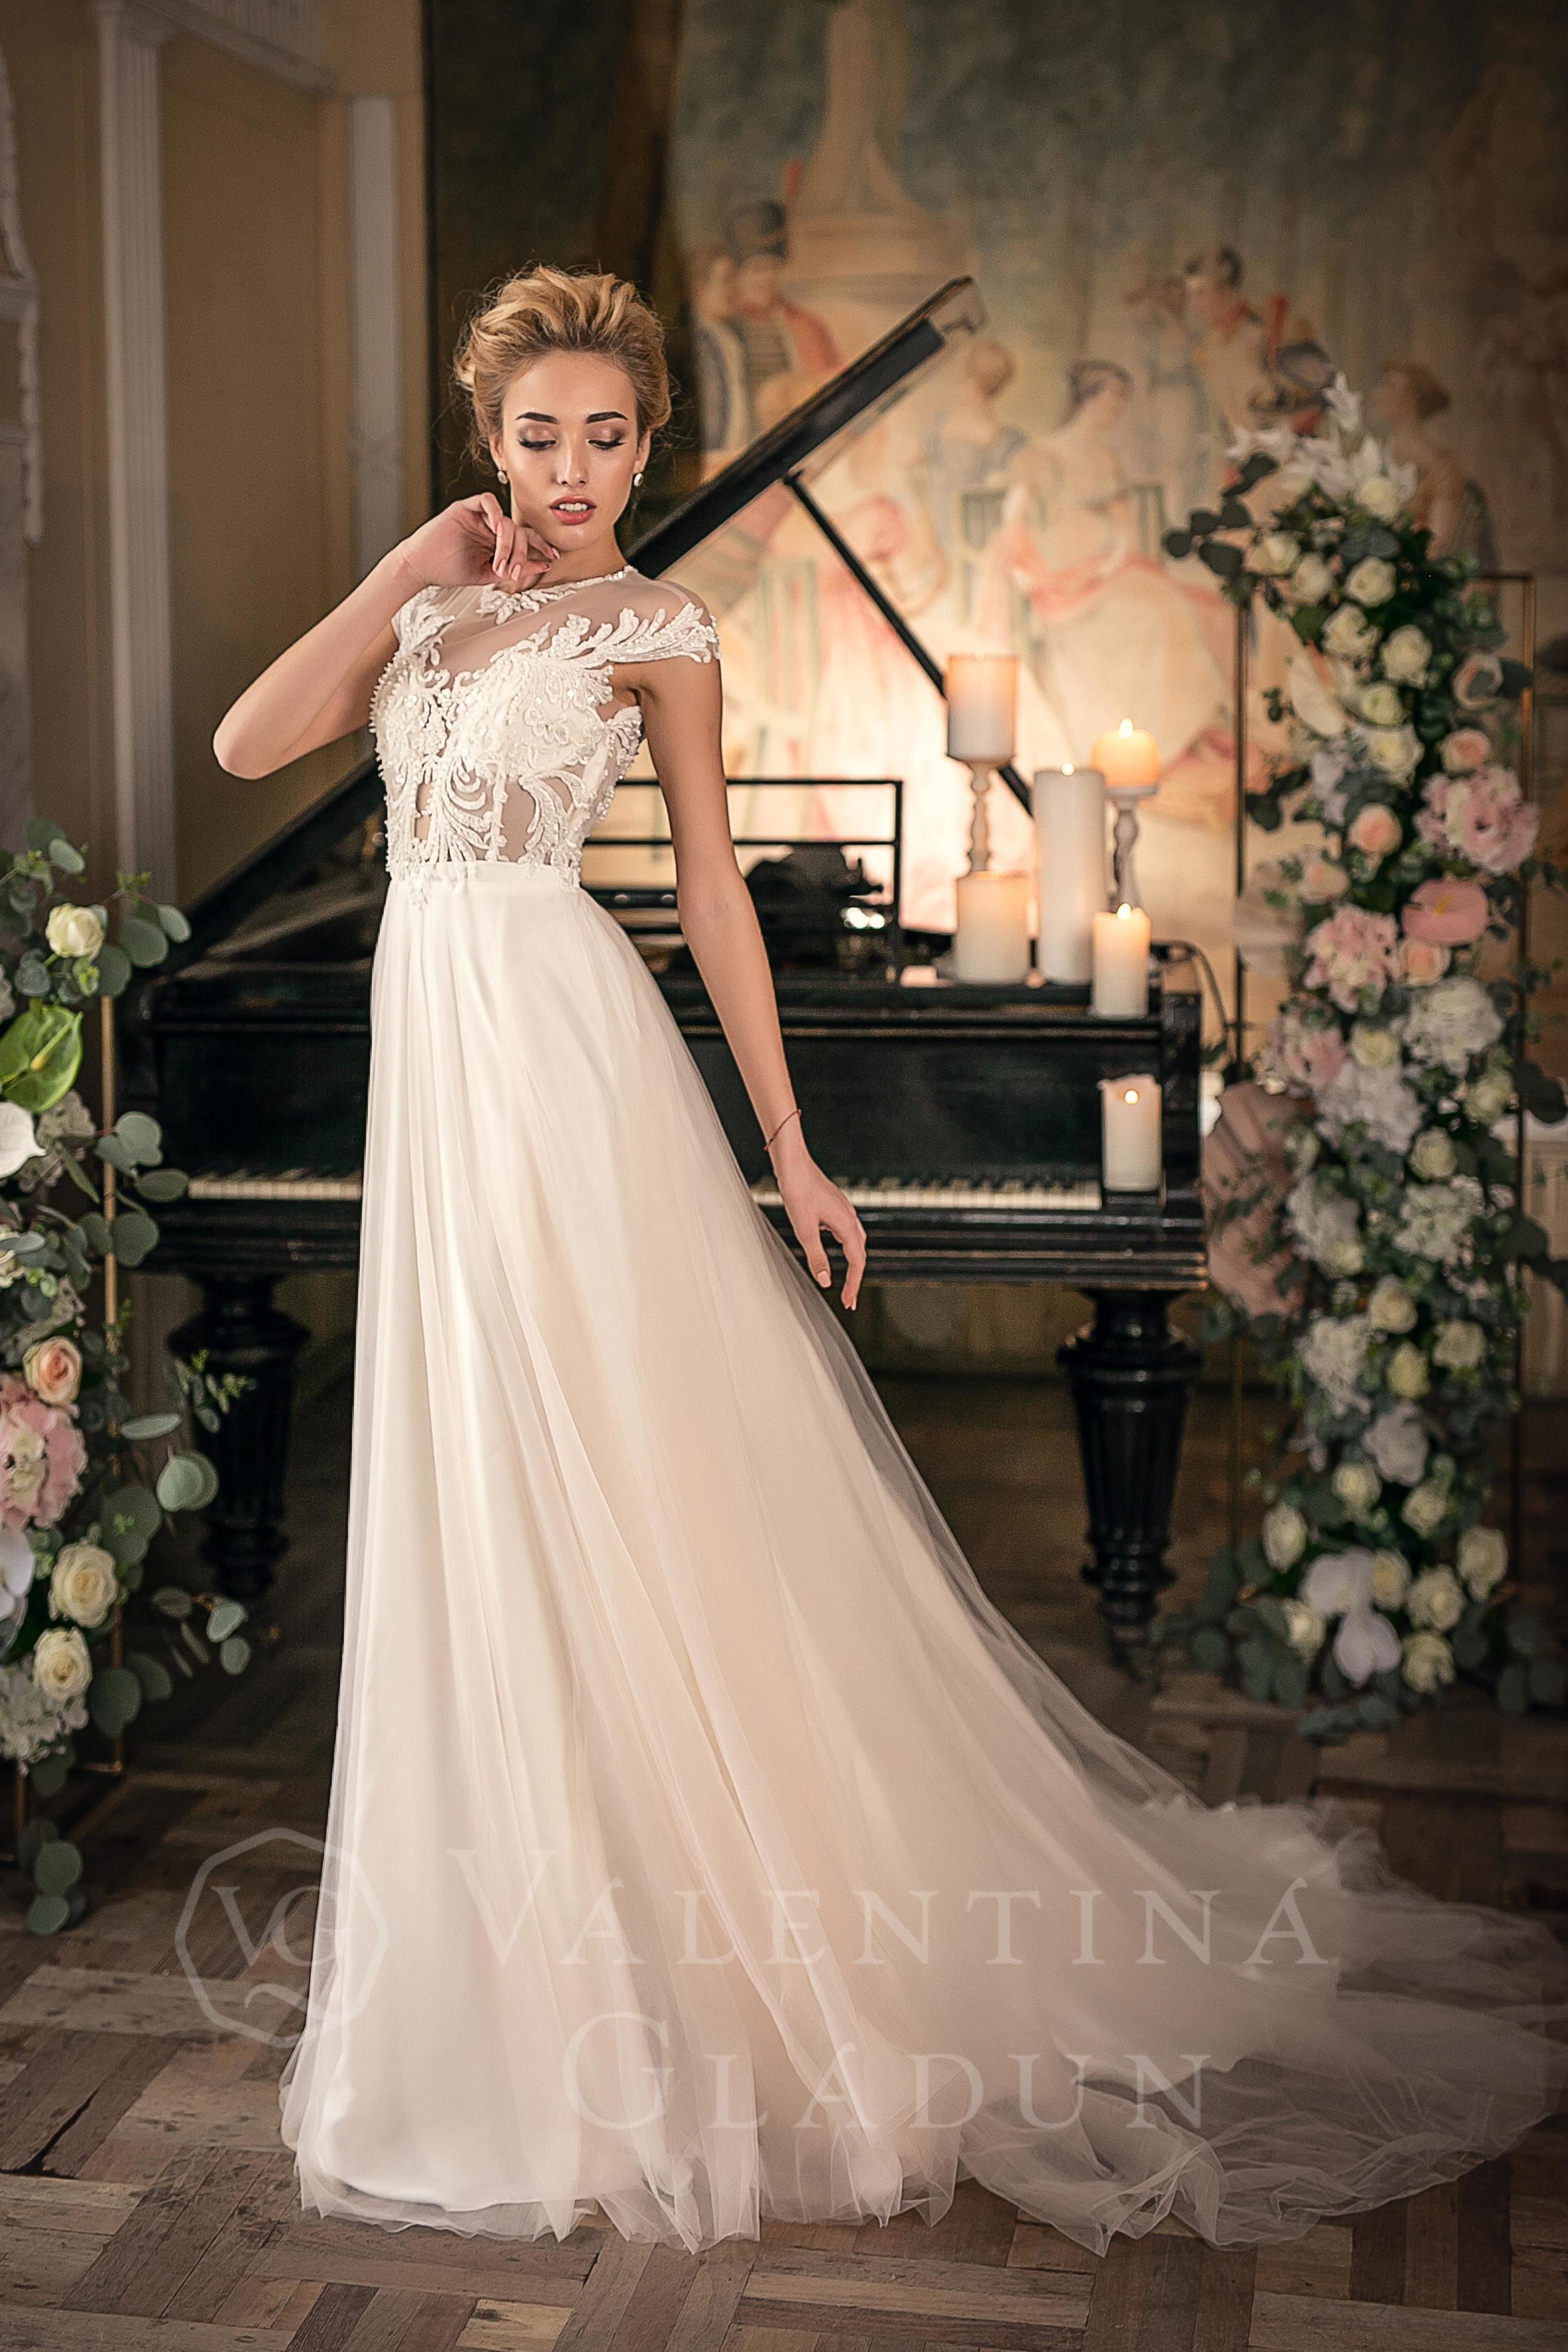 095a4e64b80 Нежное свадебное платье с легкого шелка